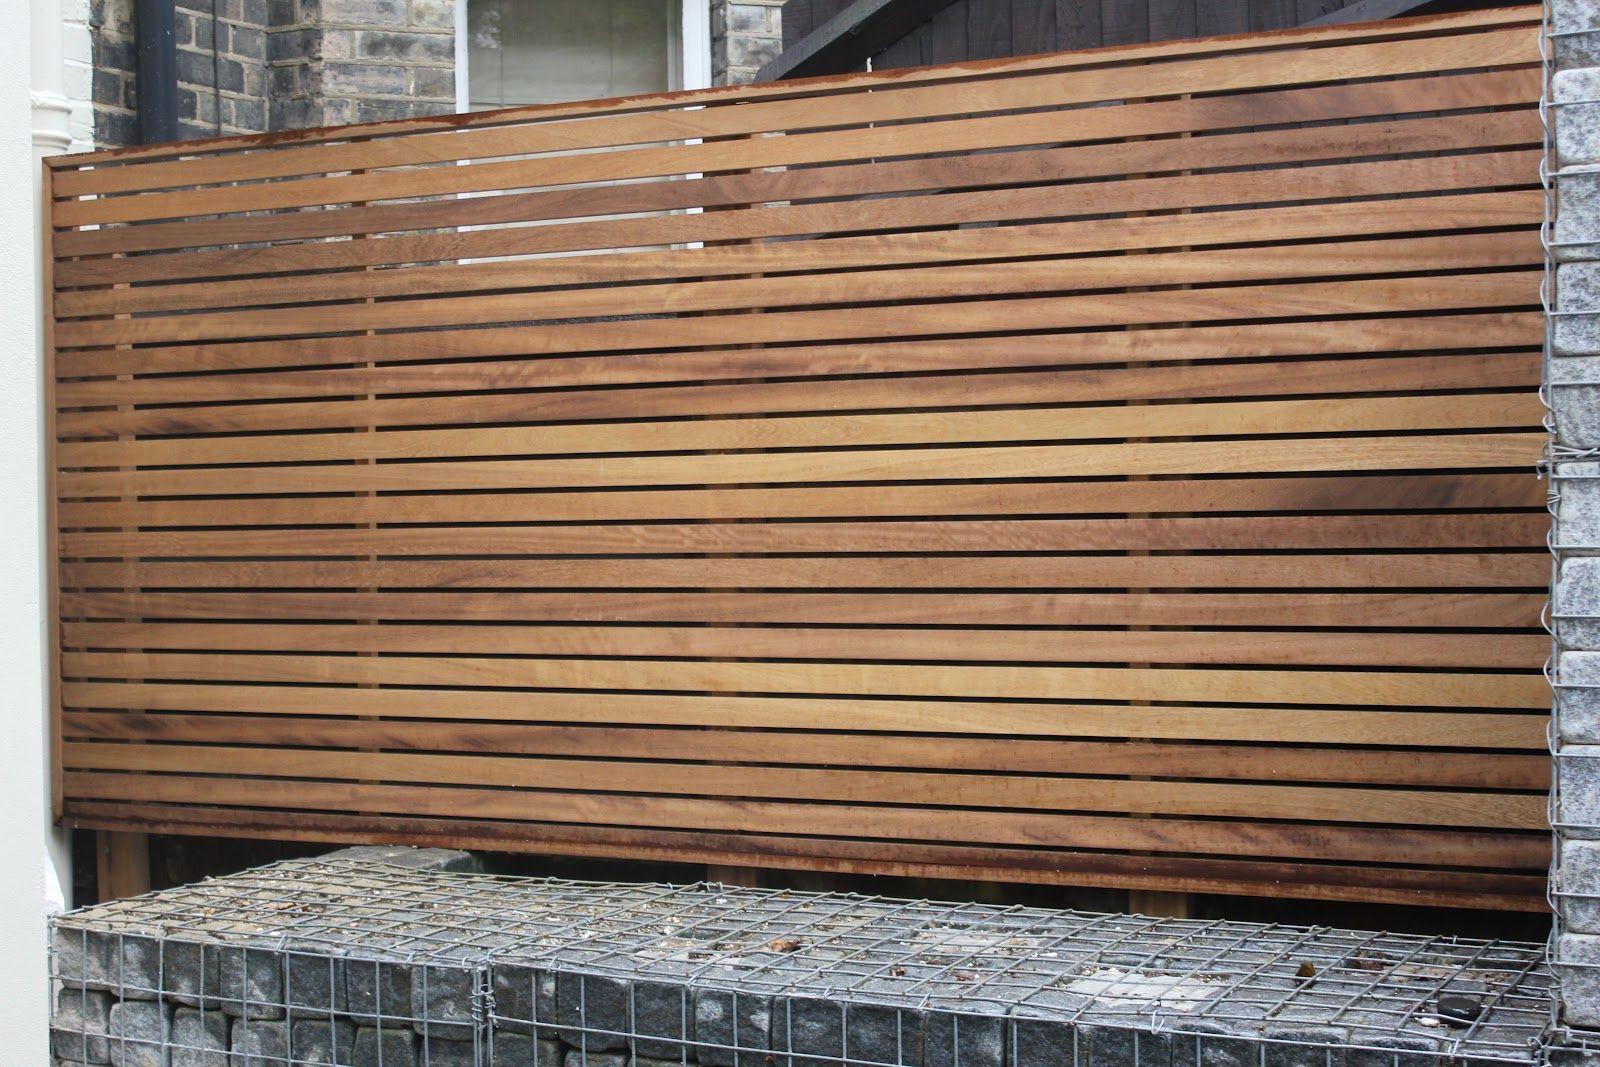 Wood Slat Walls Google Search Wood Slat Wall Wood Cladding